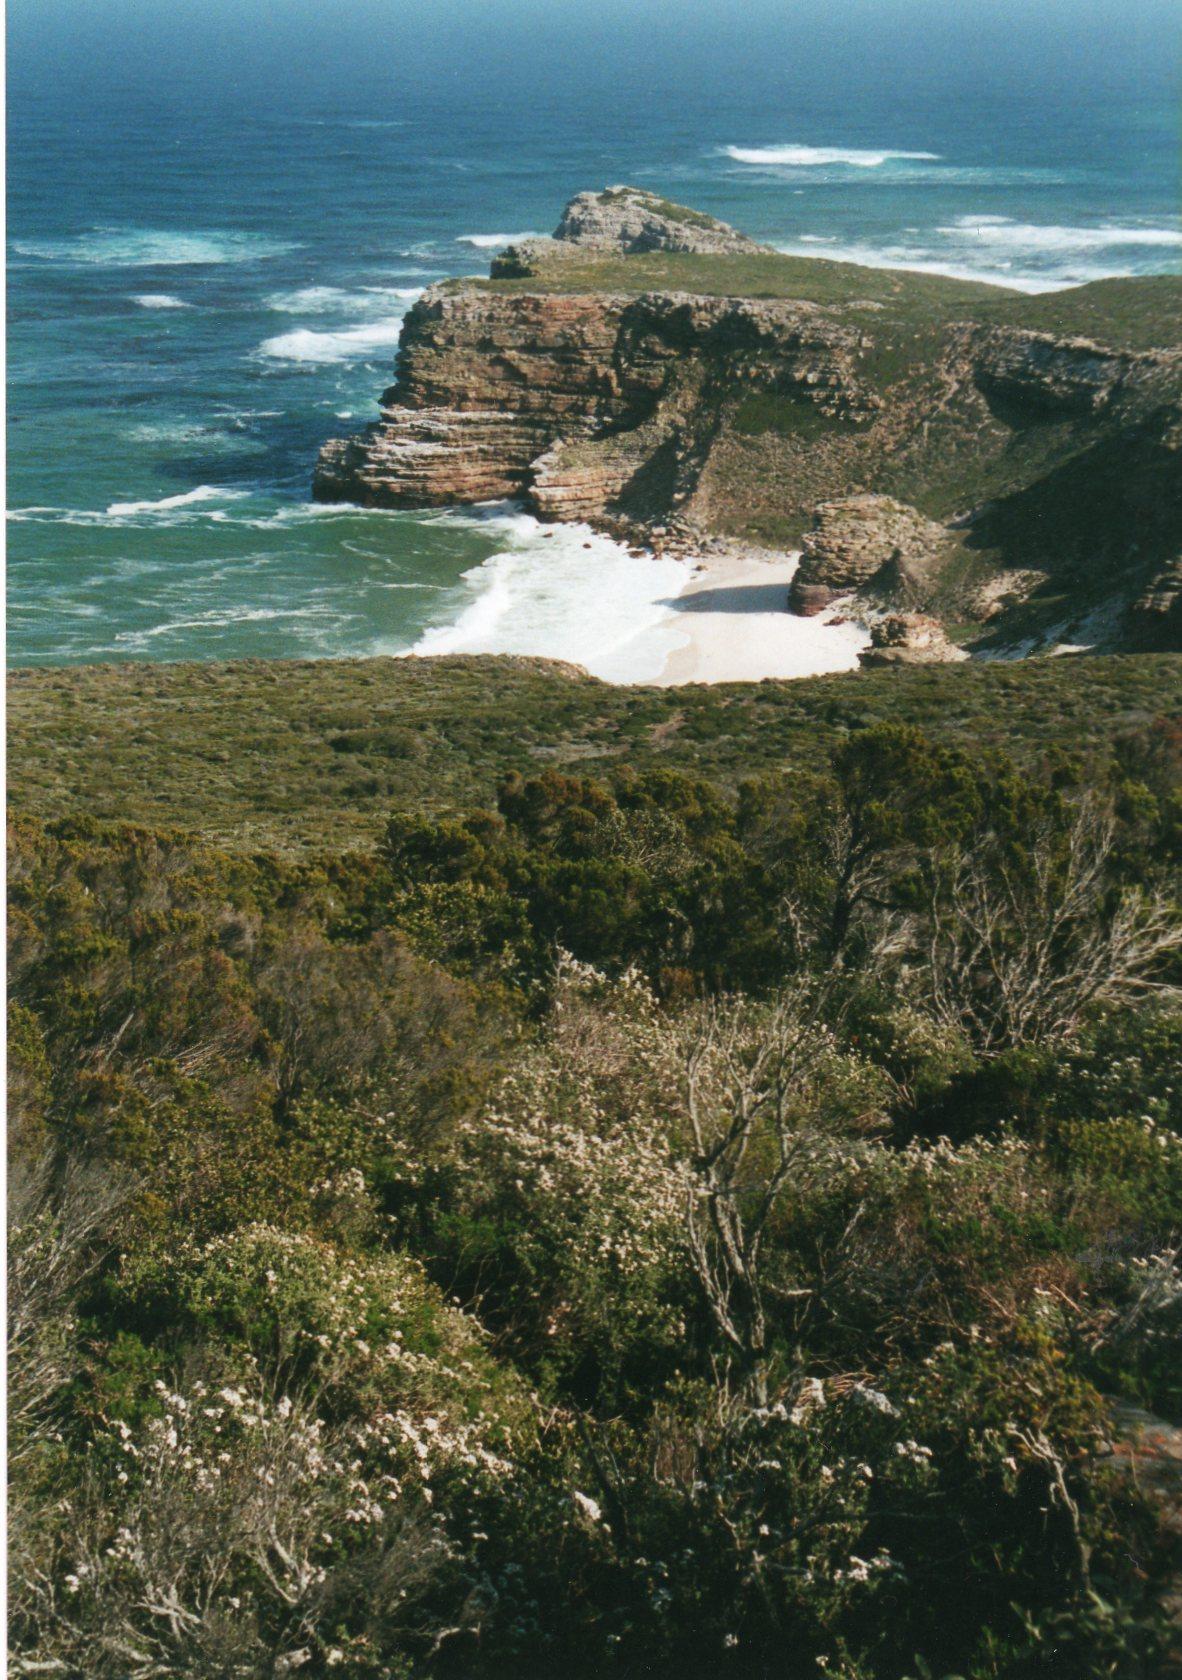 South Africa Western Cape Cape Area, Cape of Good Hope, The real Cape, Walkopedia